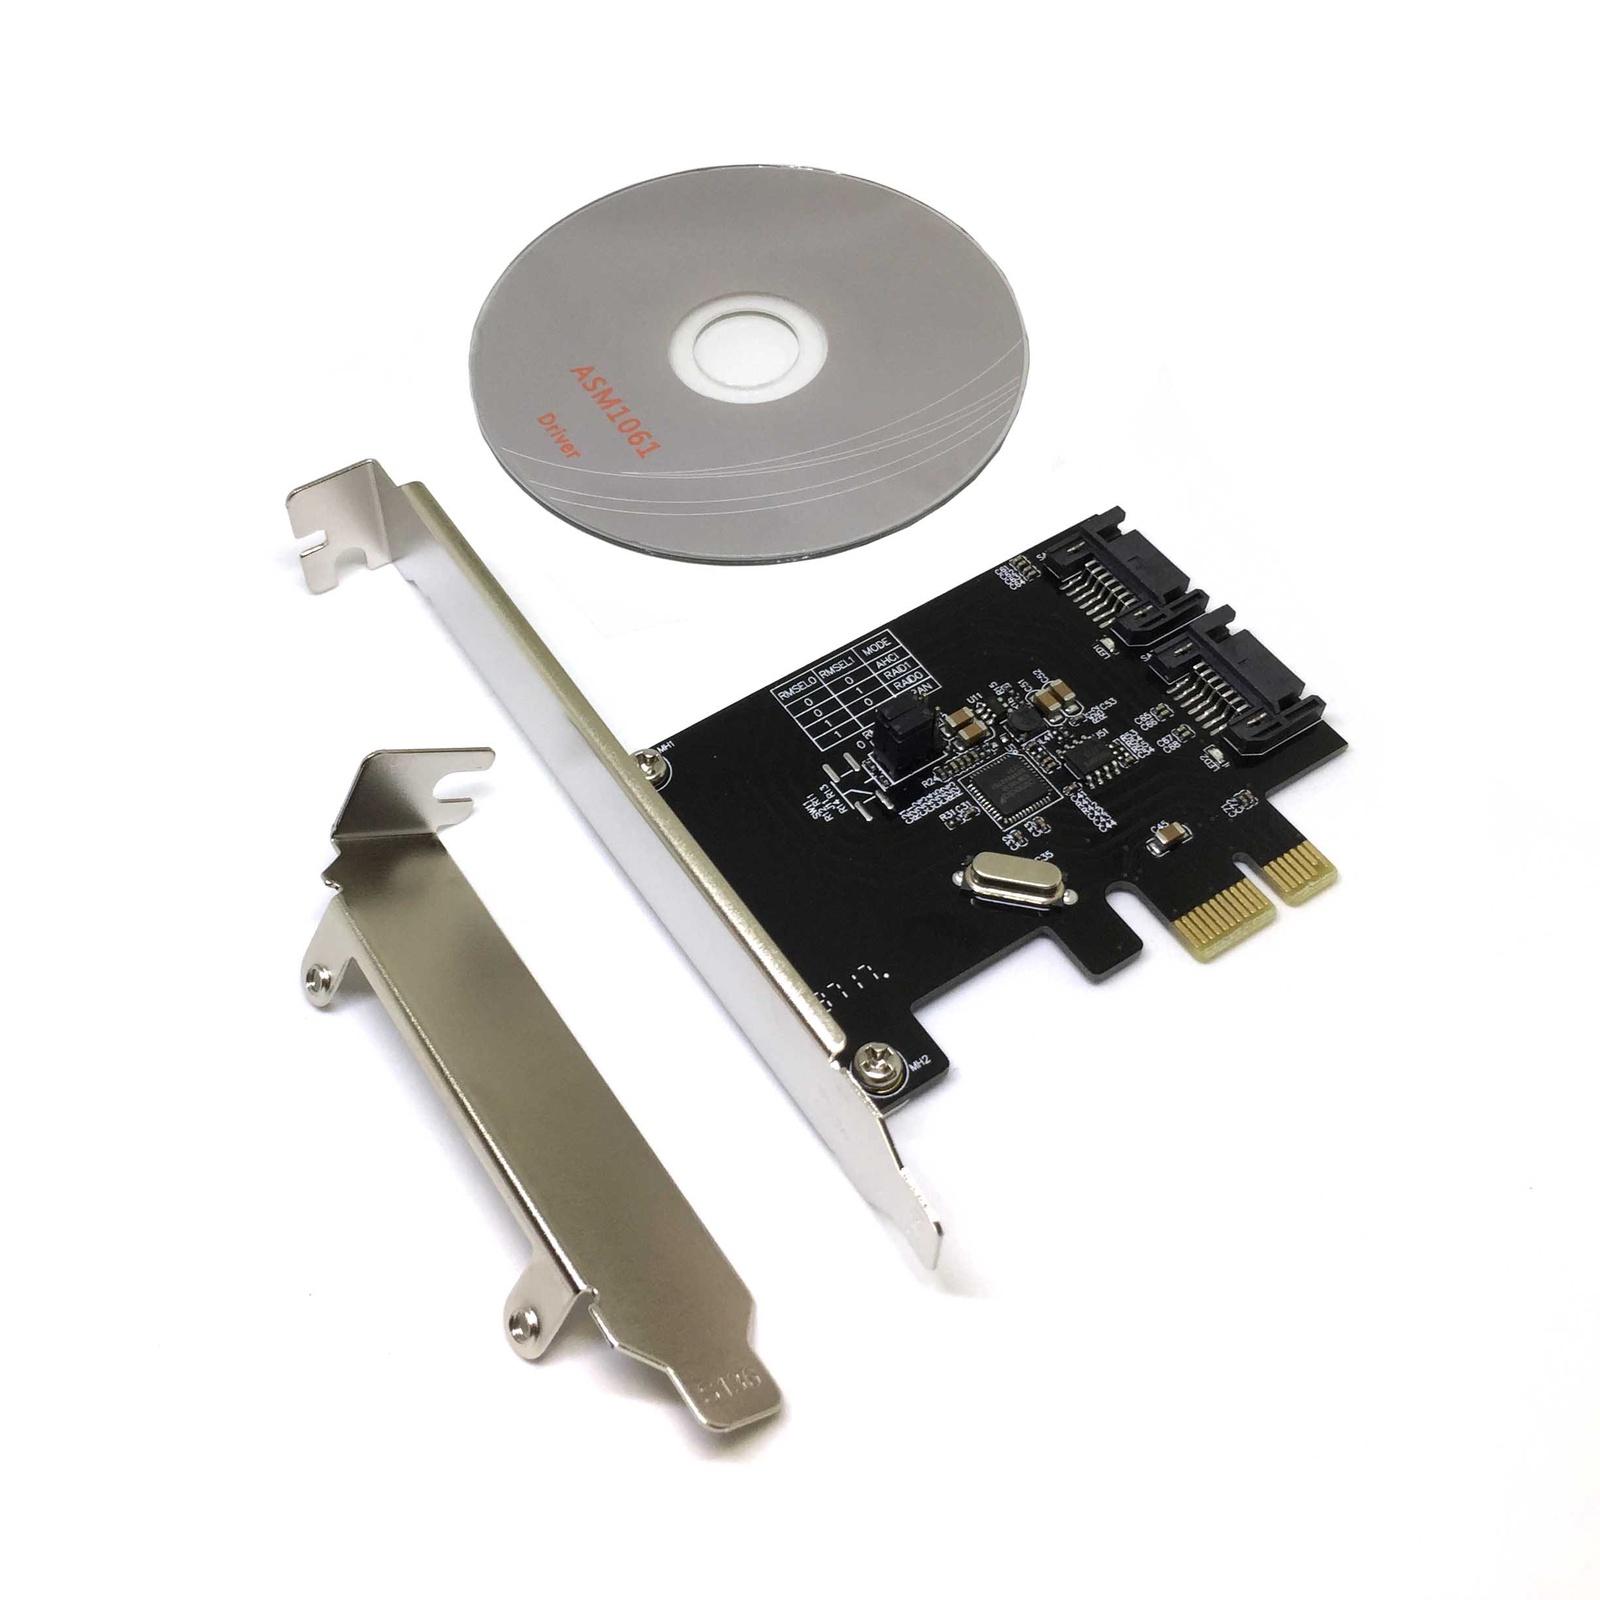 PCIe2SATA3ASM, Контроллер PCI-E 2.0 to 2 порта SATA3 (6Gb/s), RAID, чип ASM1061R, Espada